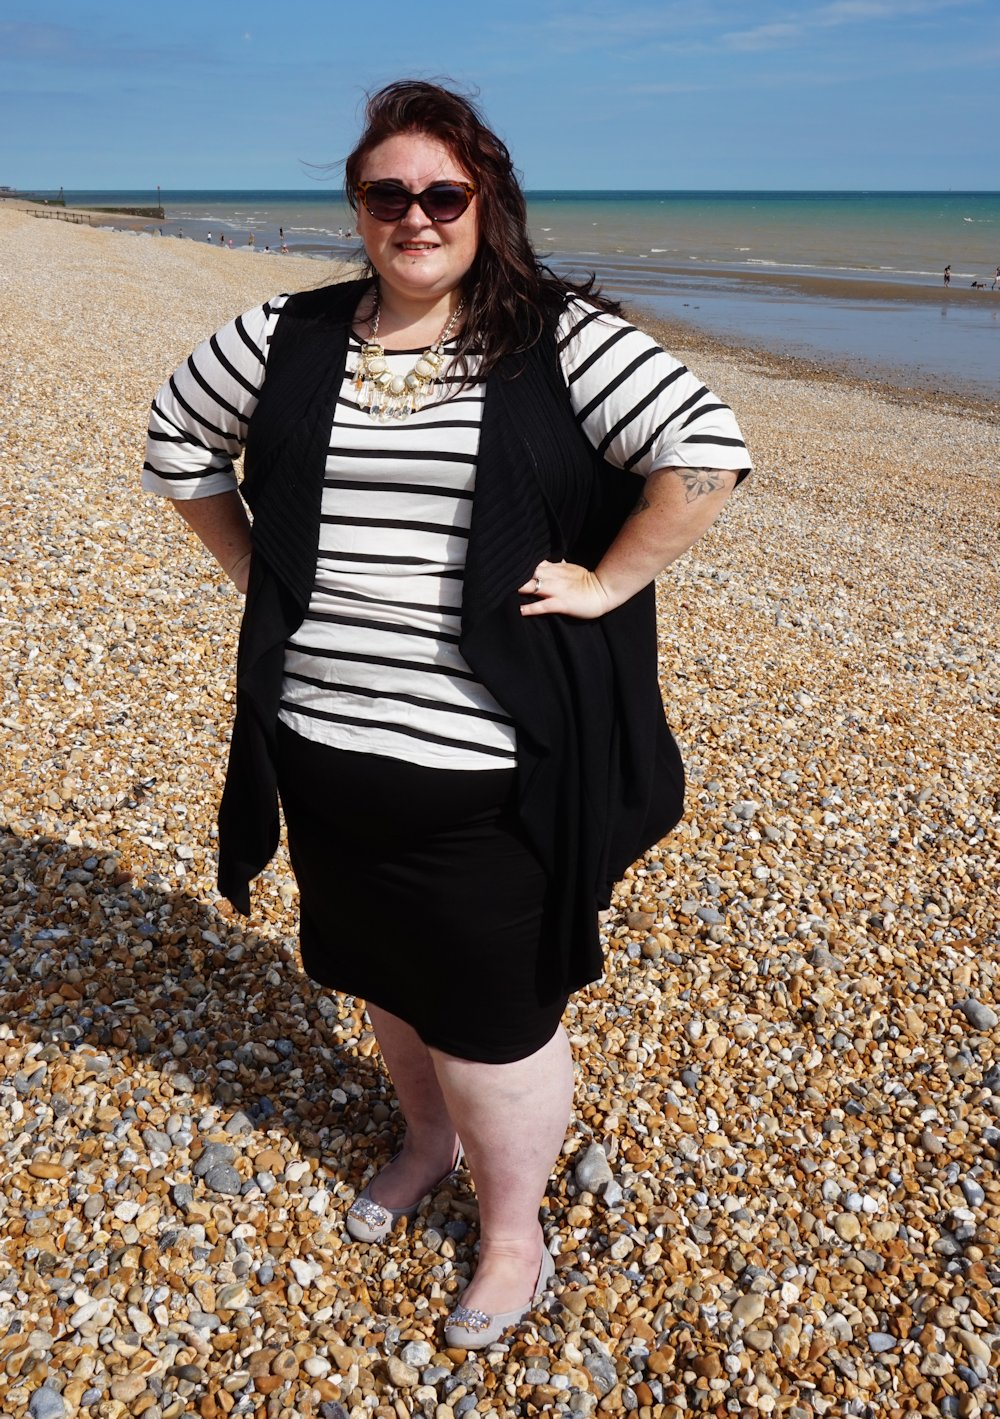 George at Asda over bump maternity skirt size 24 // www.xloveleahx.co.uk